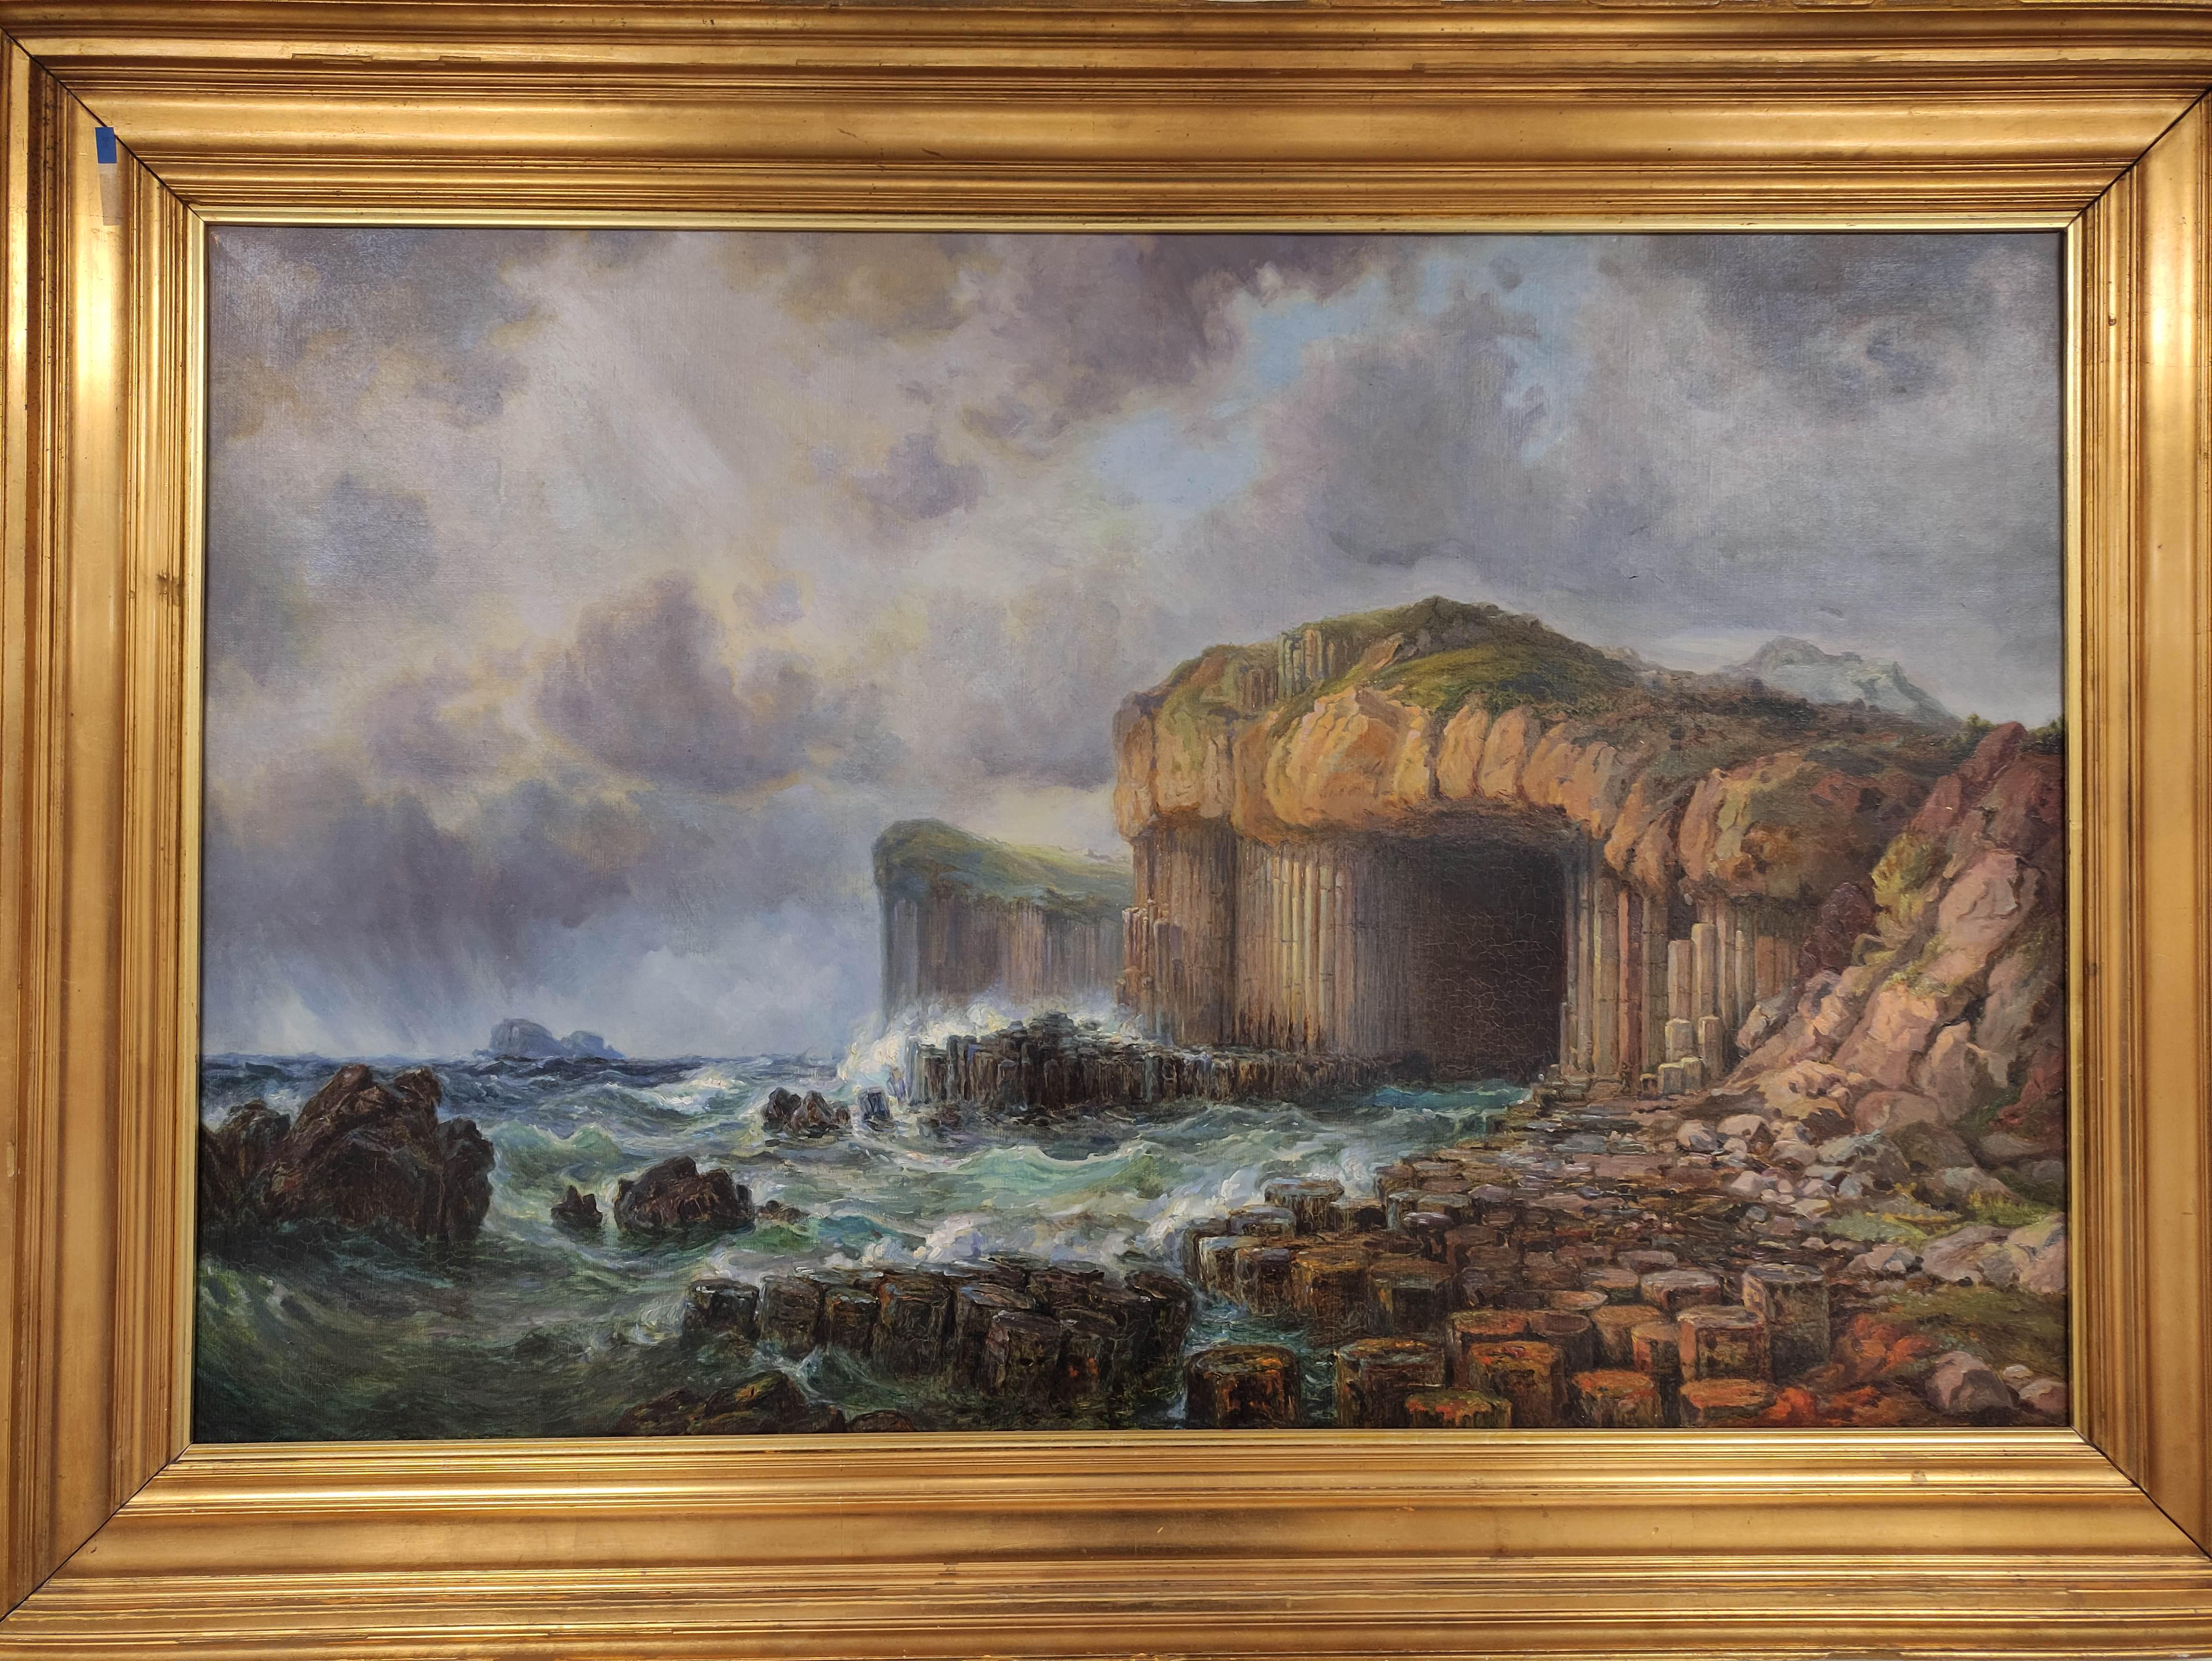 SCOTTISH SCHOOL C.1800. Fingals Cave, Staffa. Oil on canvas. 58cm x 88cm. - Image 2 of 4